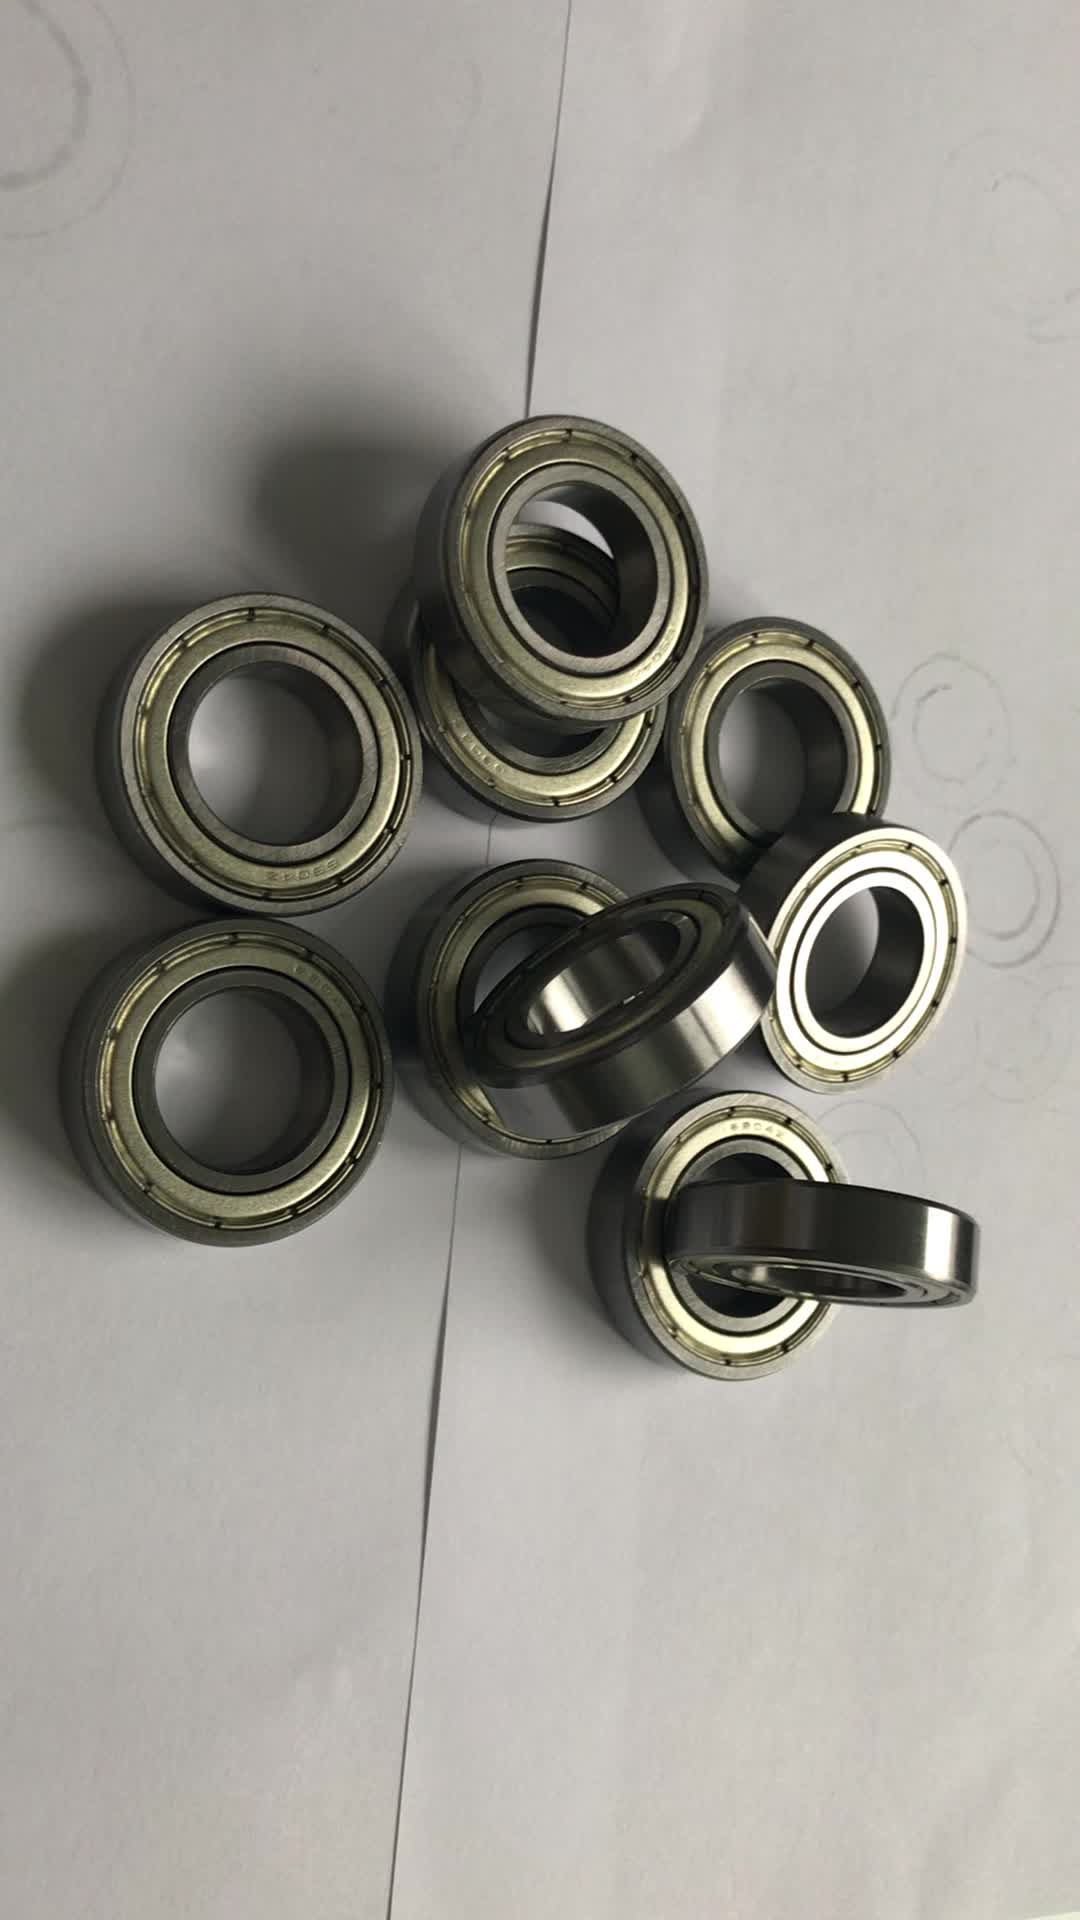 Competitive price deep groove ball bearing 6005 6005 zz 6005 2rs rodamientos de bolas